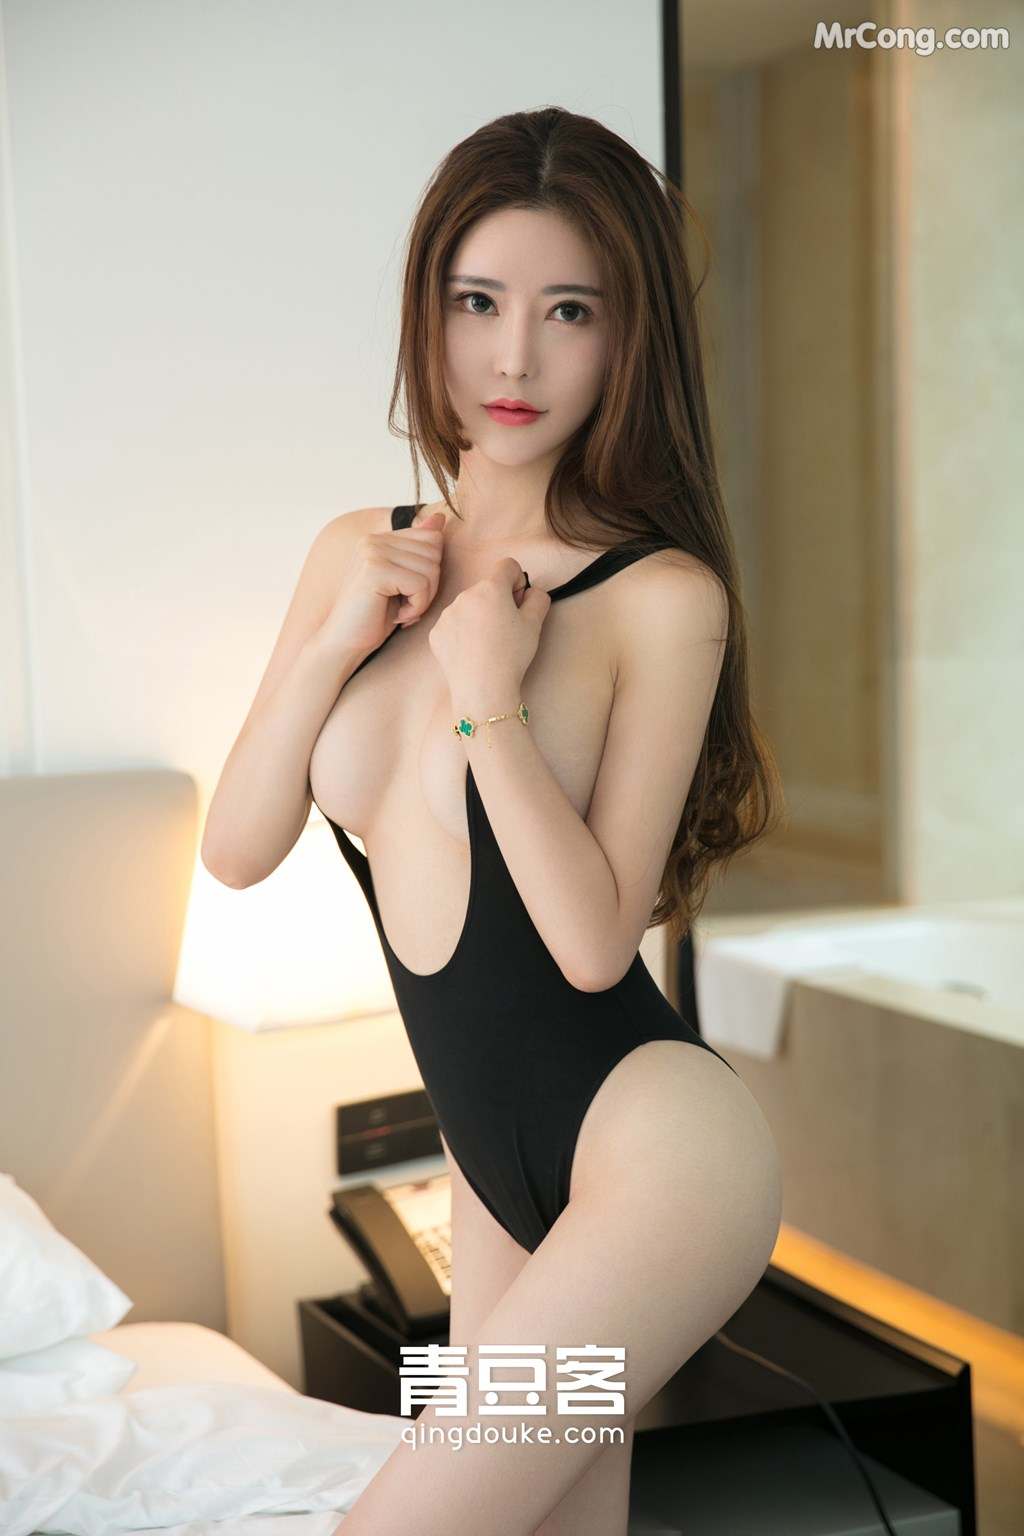 Image QingDouKe-2017-11-12-Tong-Man-MrCong.com-002 in post QingDouKe 2017-11-12: Người mẫu Tong Man (佟蔓) (50 ảnh)